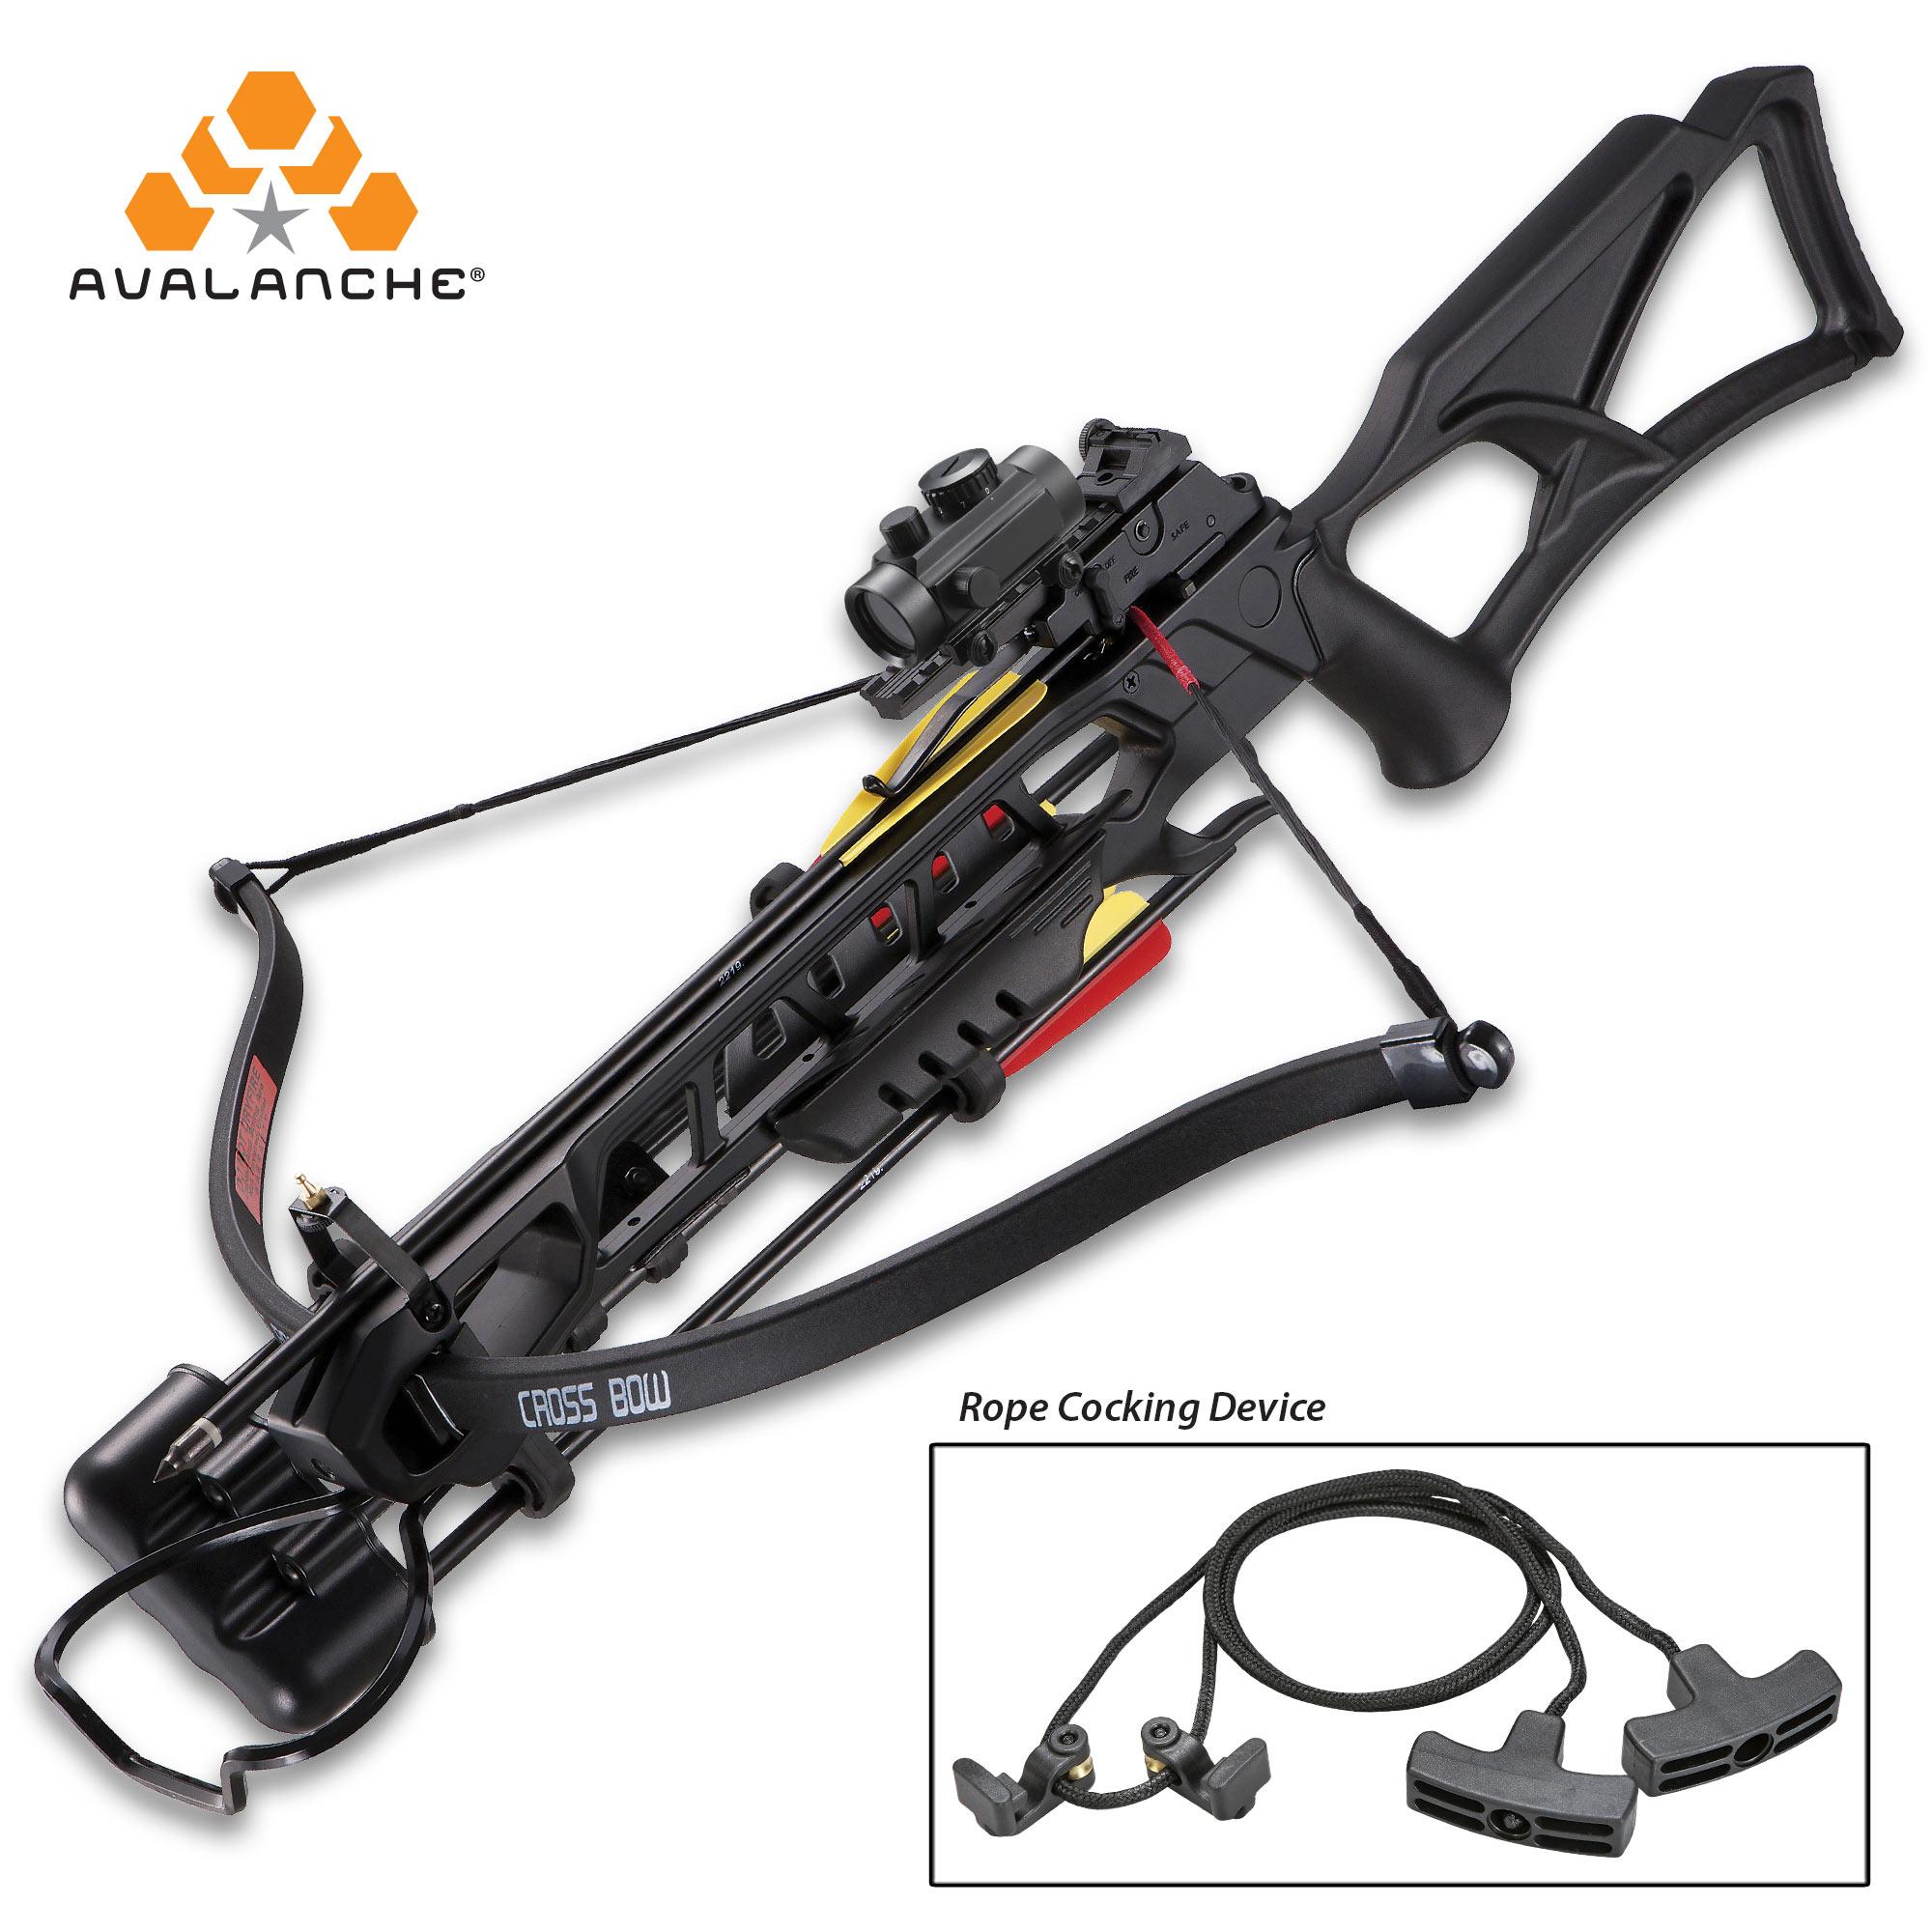 Avalanche Anaconda Recurve Black Crossbow - Composite Stock, 175-LB Draw,  245 FPS, Red-Dot Scope, Picatinny Rail